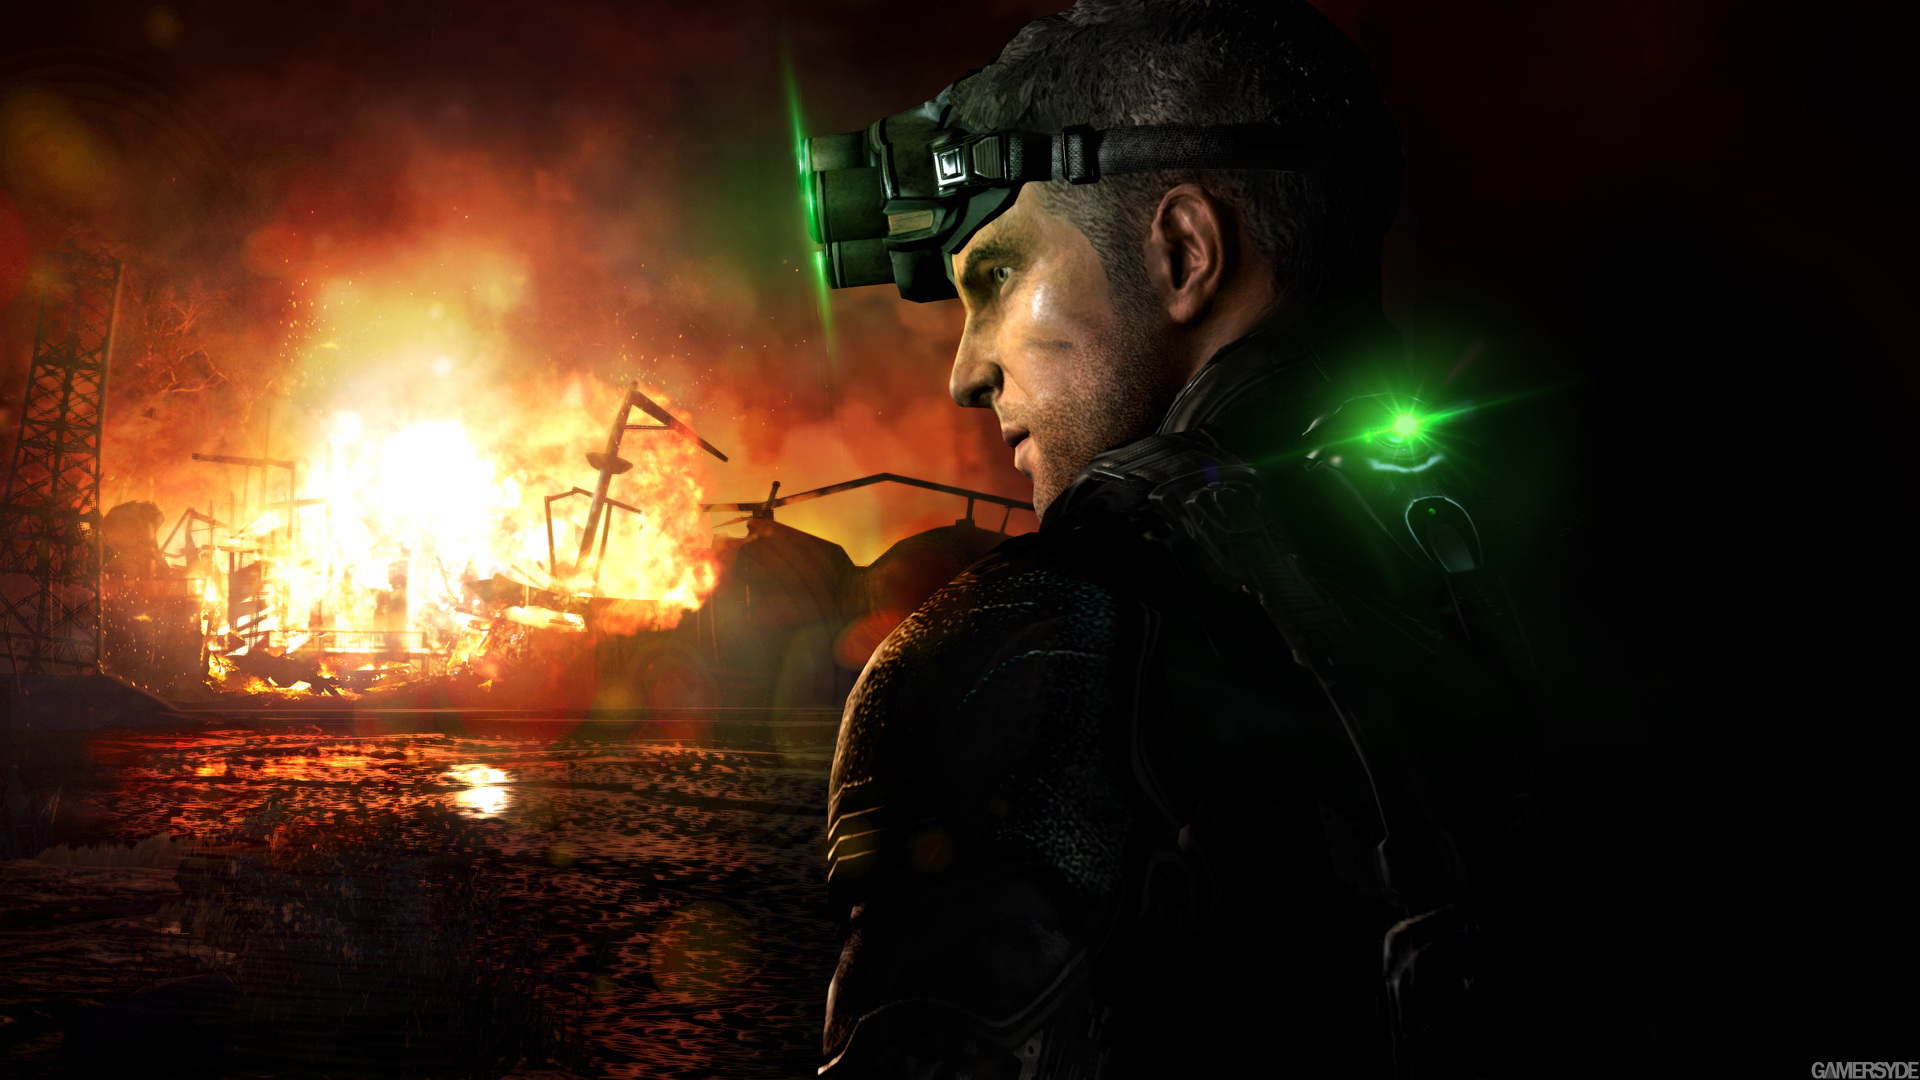 image tom clancy s splinter cell blacklist 22410 2521 0005 با تصاویر جدید Splinter Cell: Blacklist همراه باشید